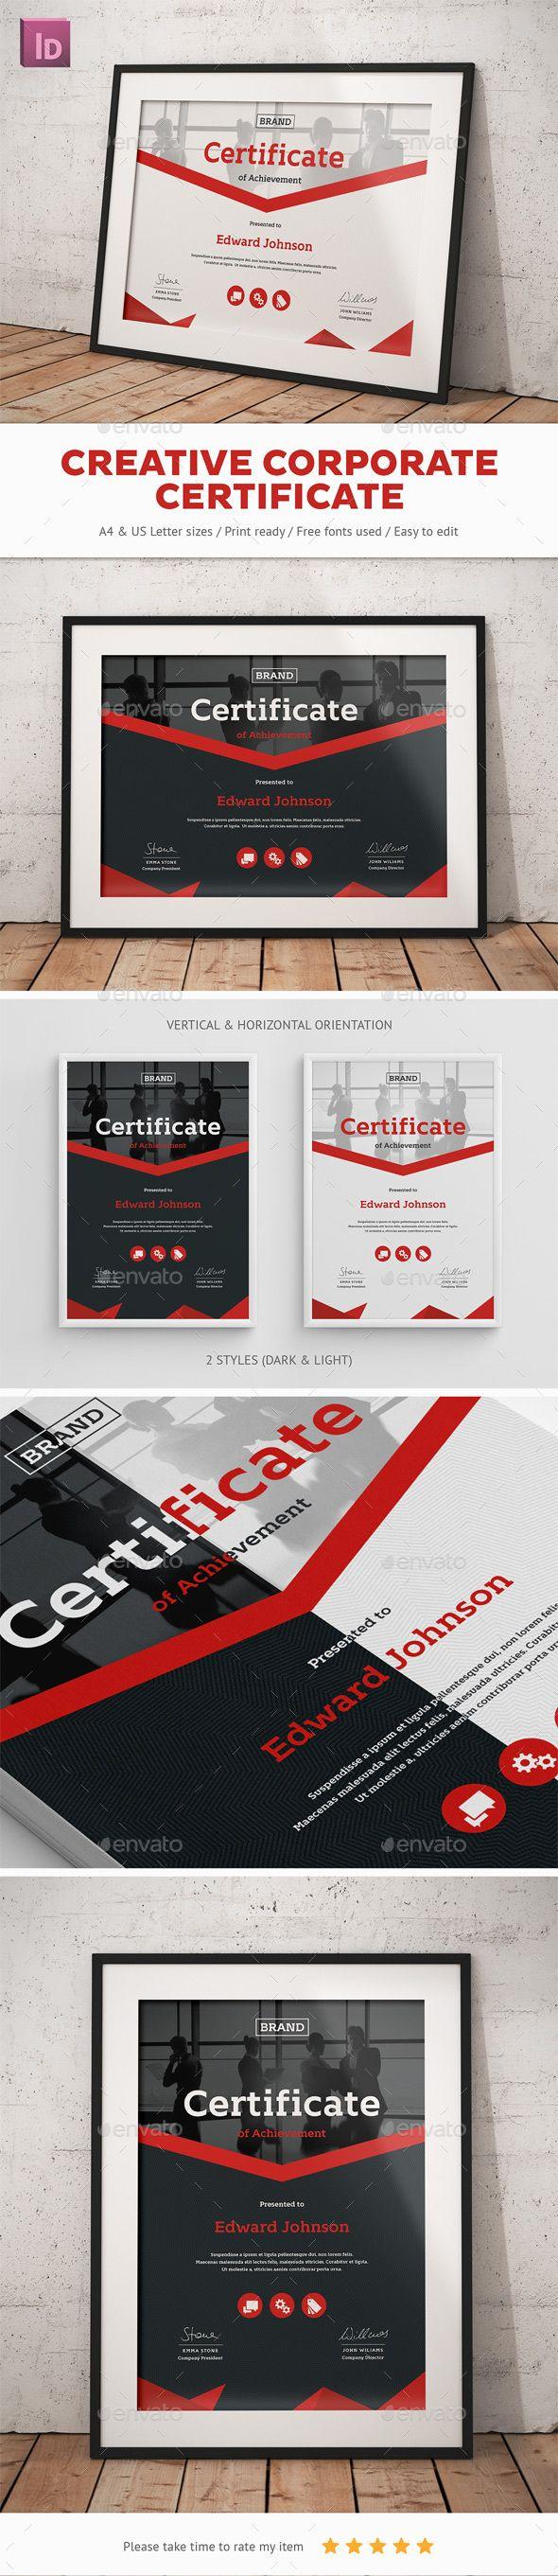 Creative corporate certificate certificate creative and template creative corporate certificate xflitez Image collections